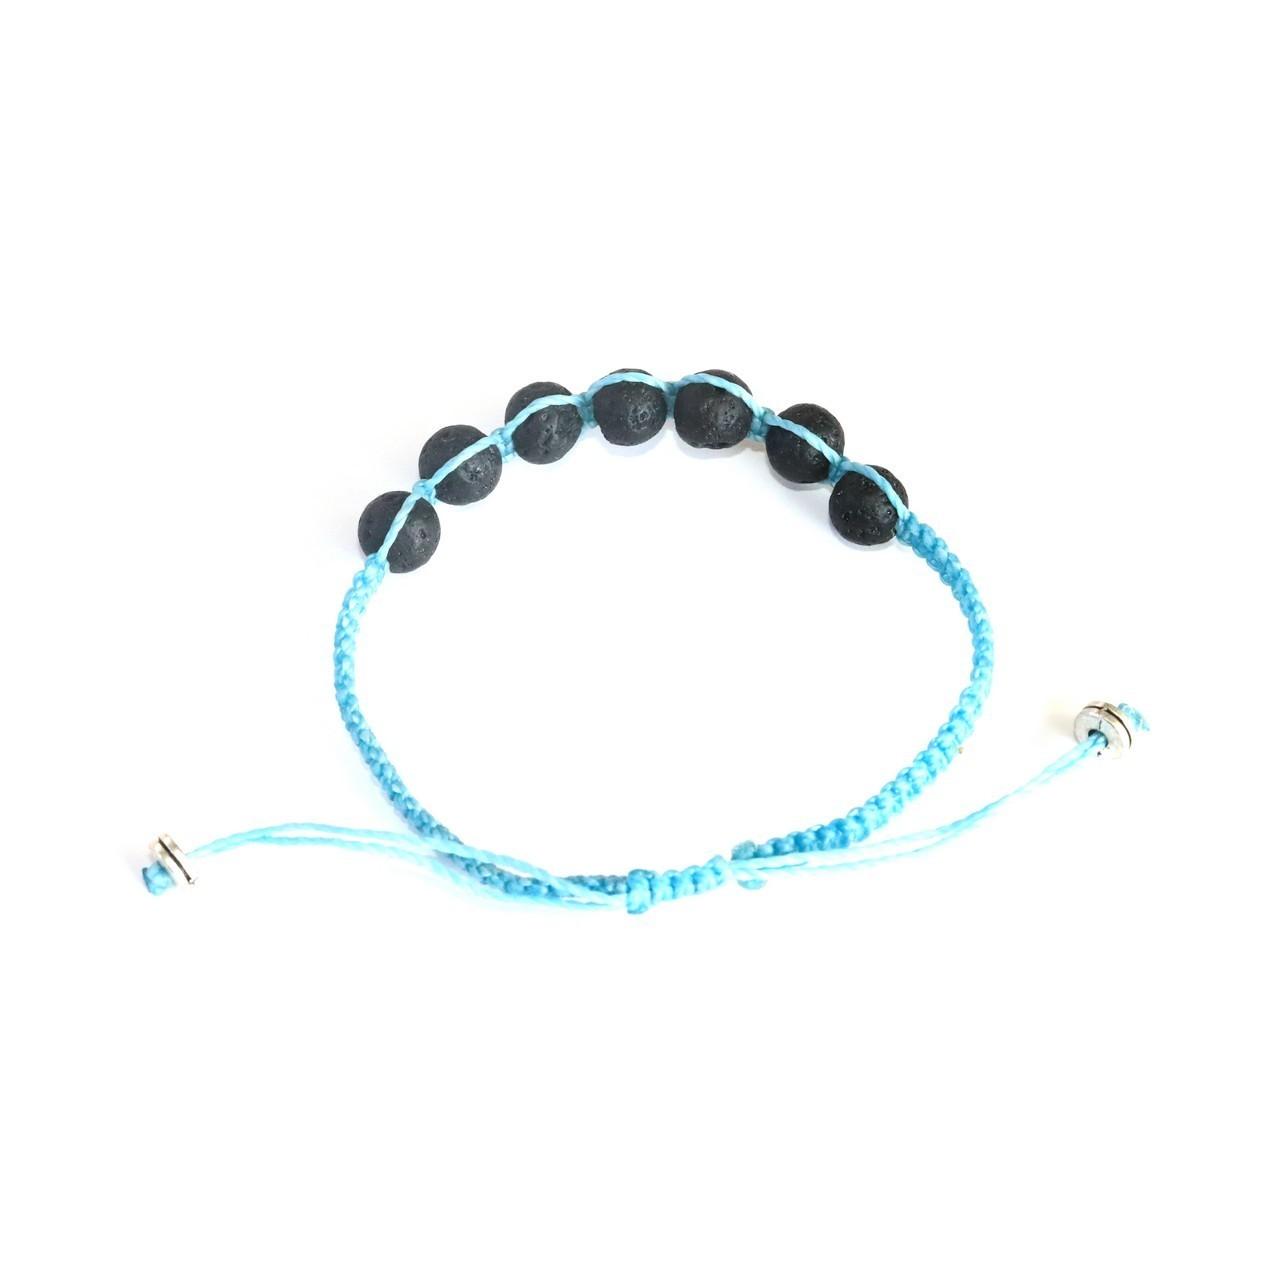 Stress Free Diffuser Bracelet